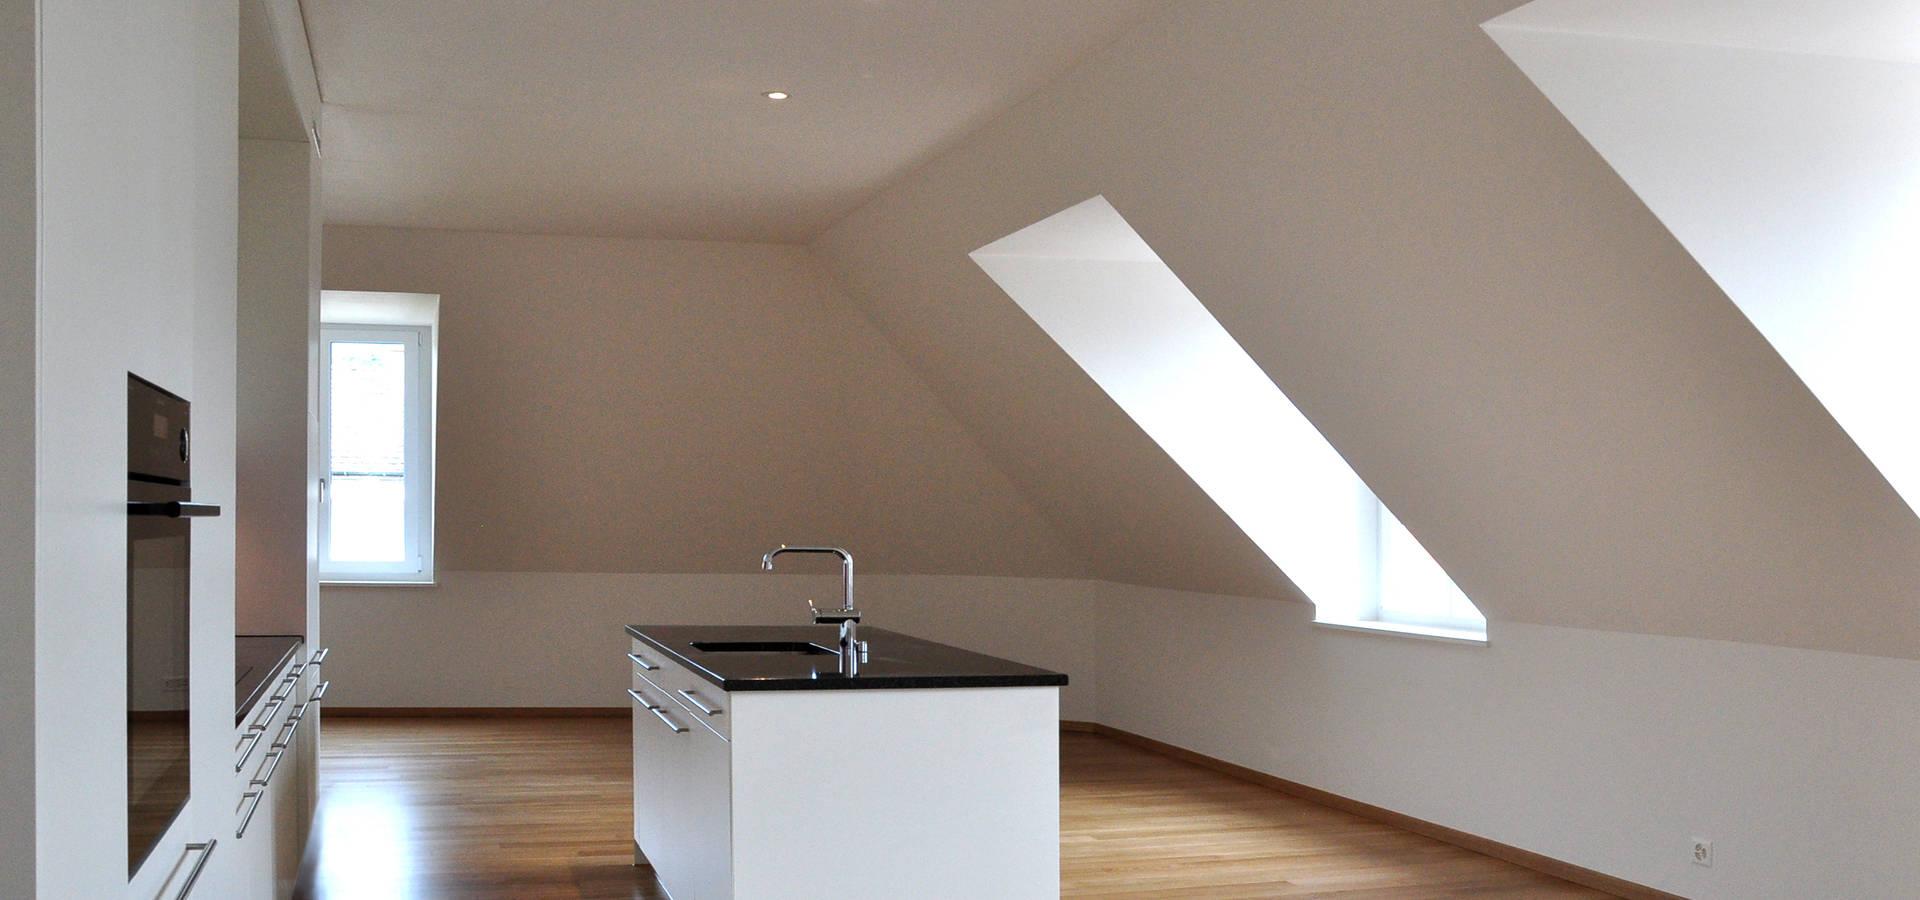 Patrick Rüdisüli Architekten GmbH